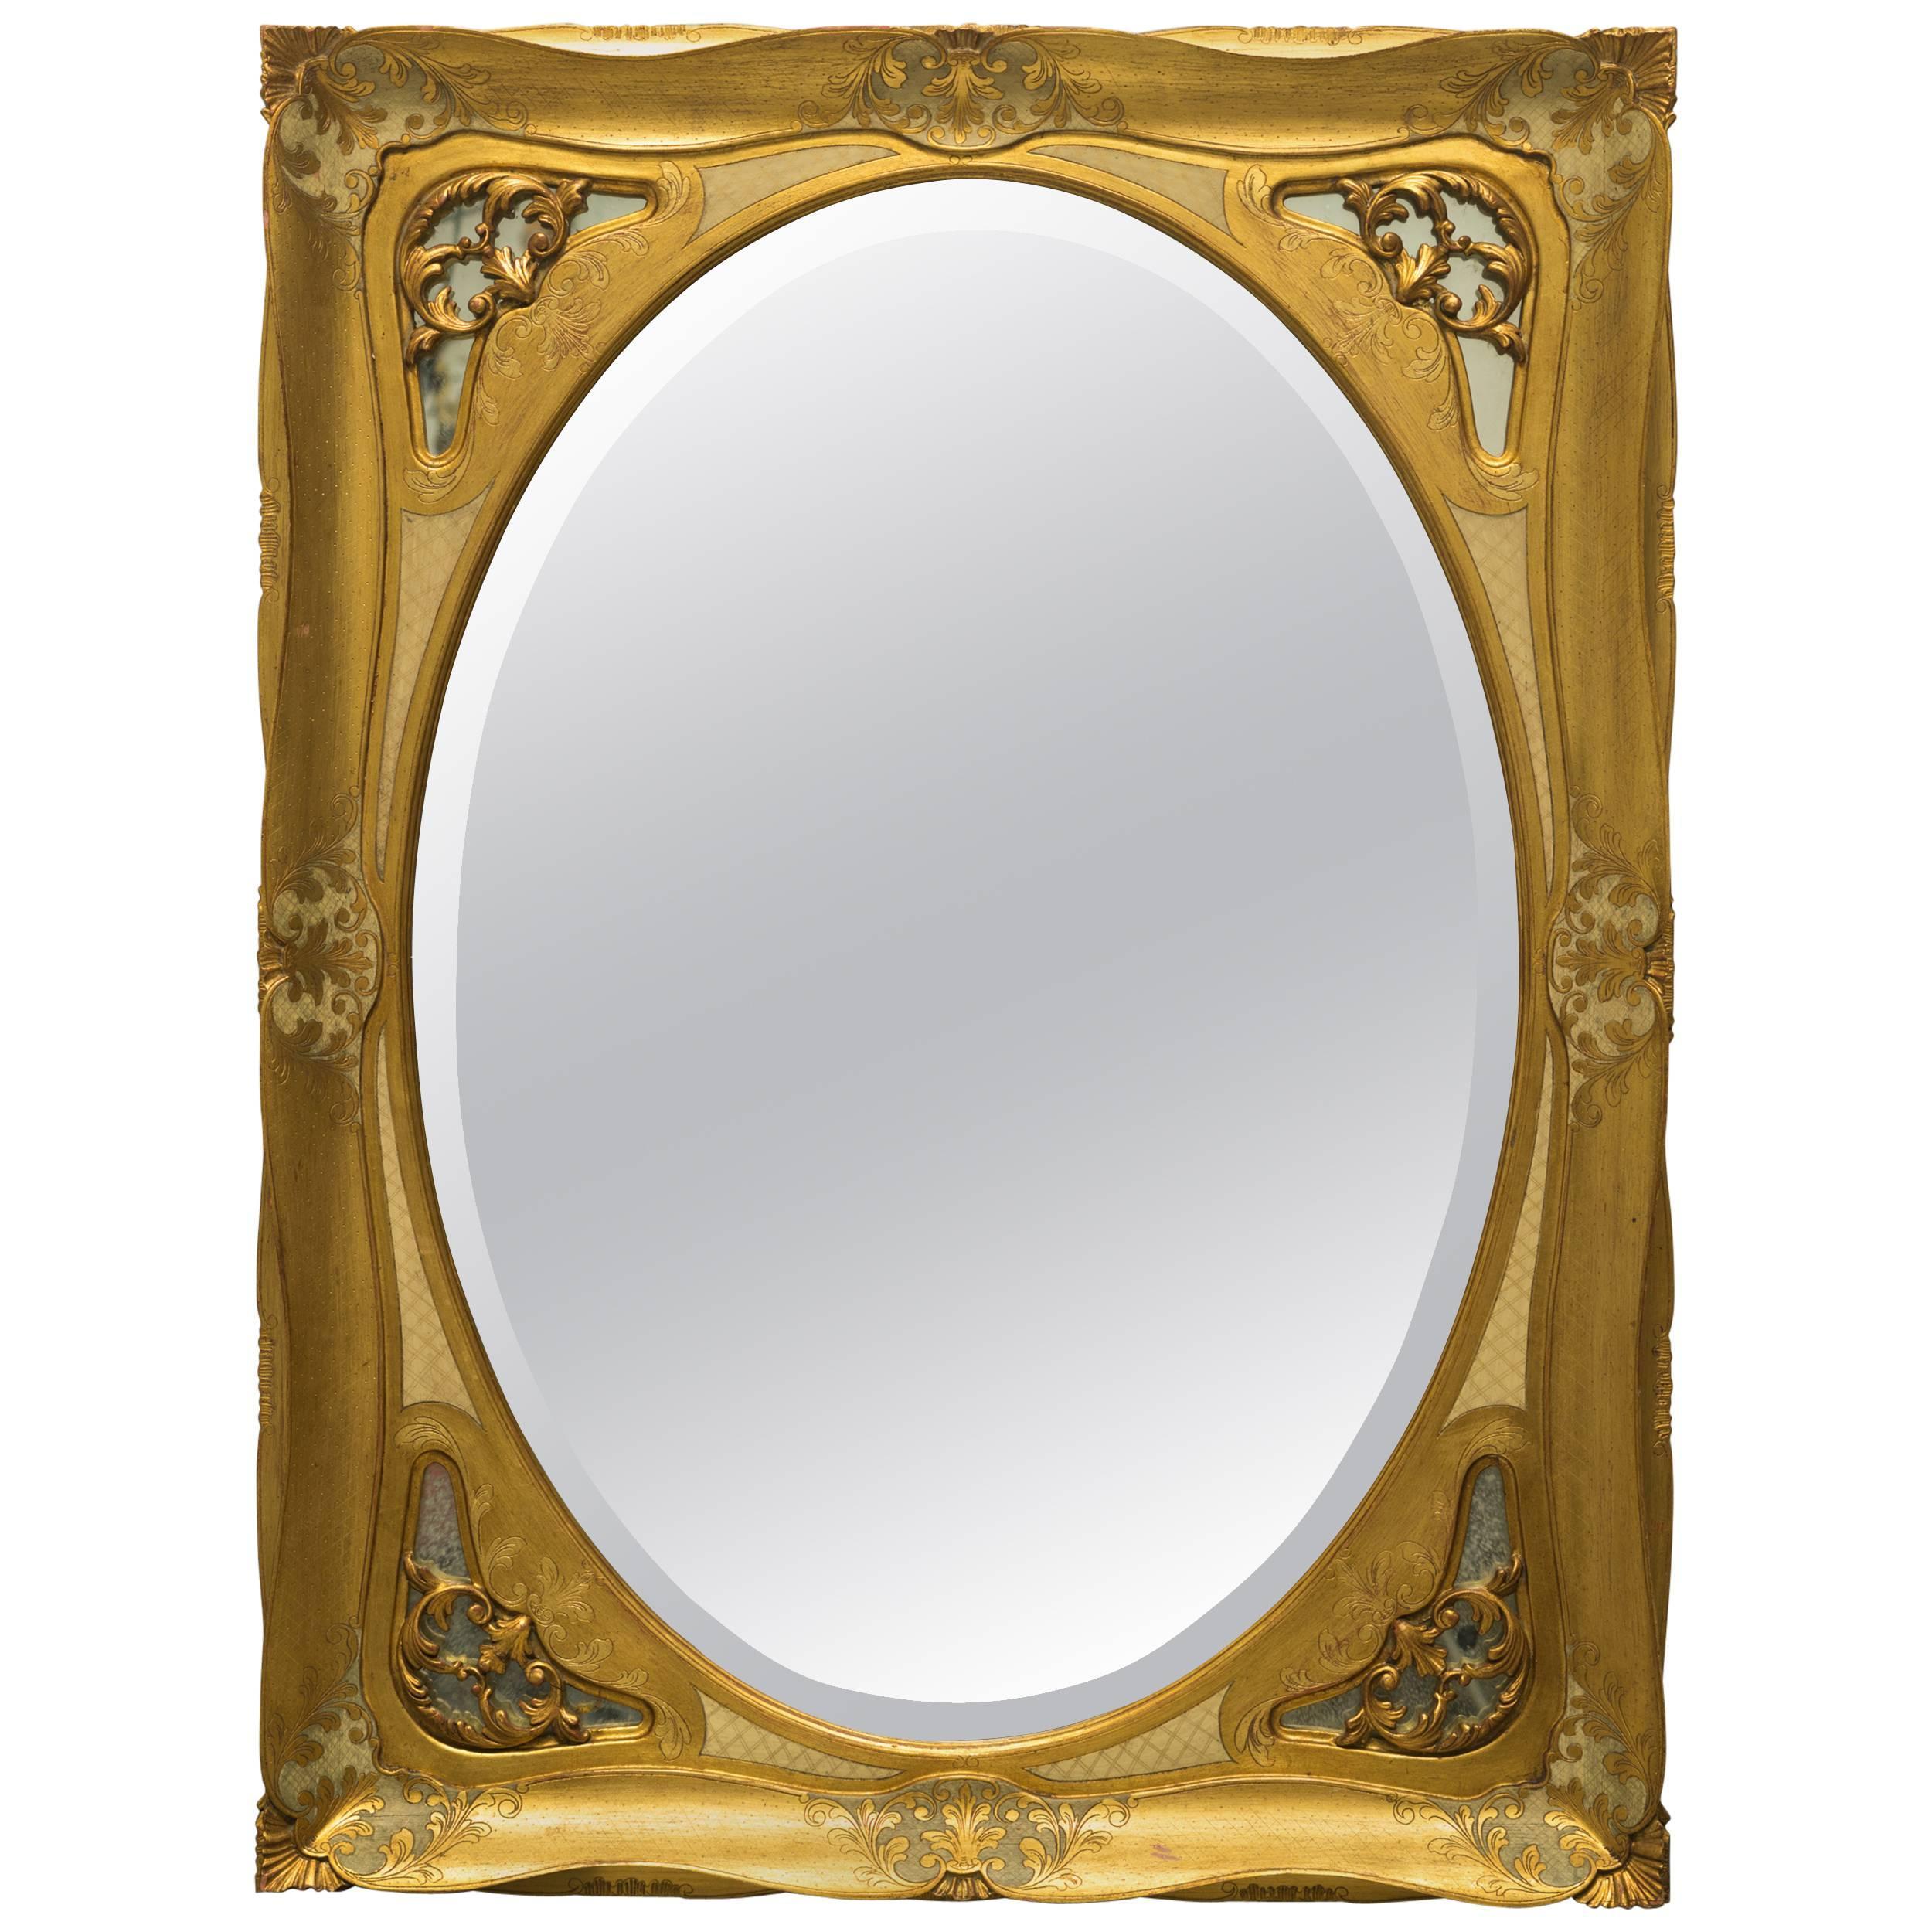 Large Giltwood Florentine Wall Mirror